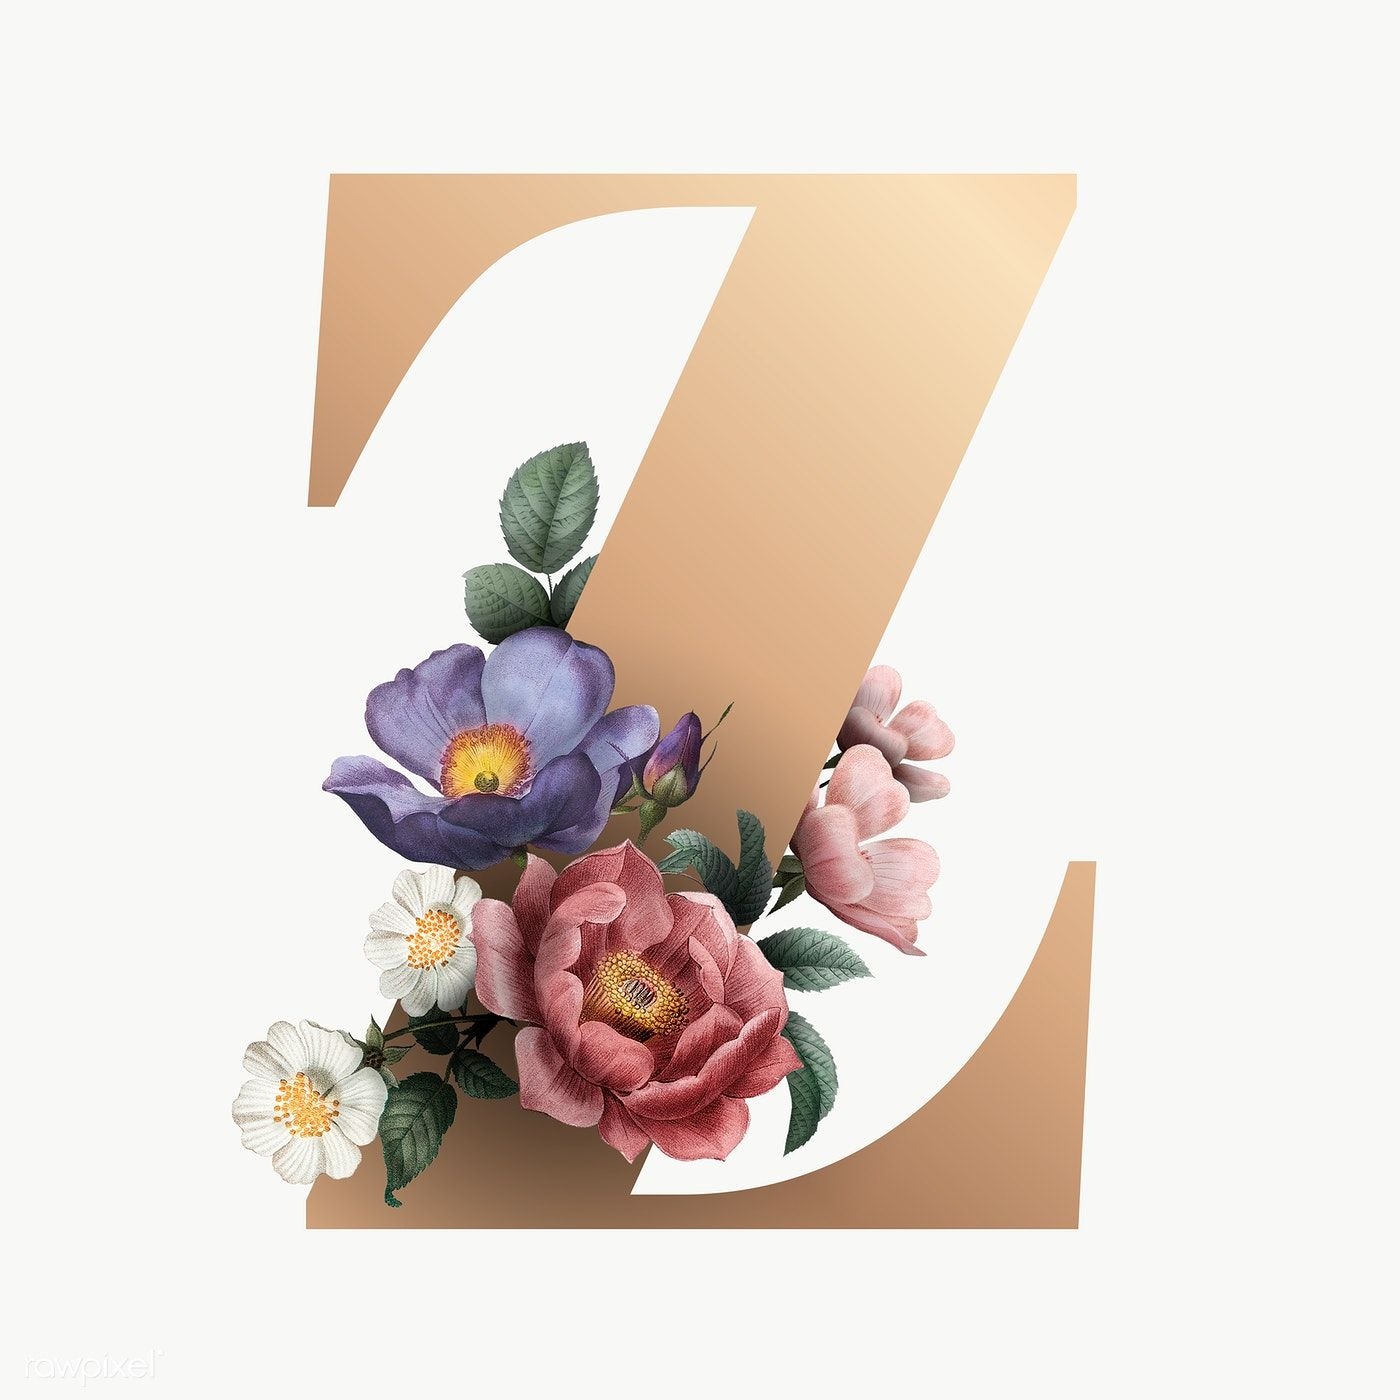 Classic And Elegant Floral Alphabet Font Letter Z Transparent Png Free Image By Rawpixel Com Manota In 2020 Fonts Alphabet Lettering Fonts Lettering Alphabet Fonts